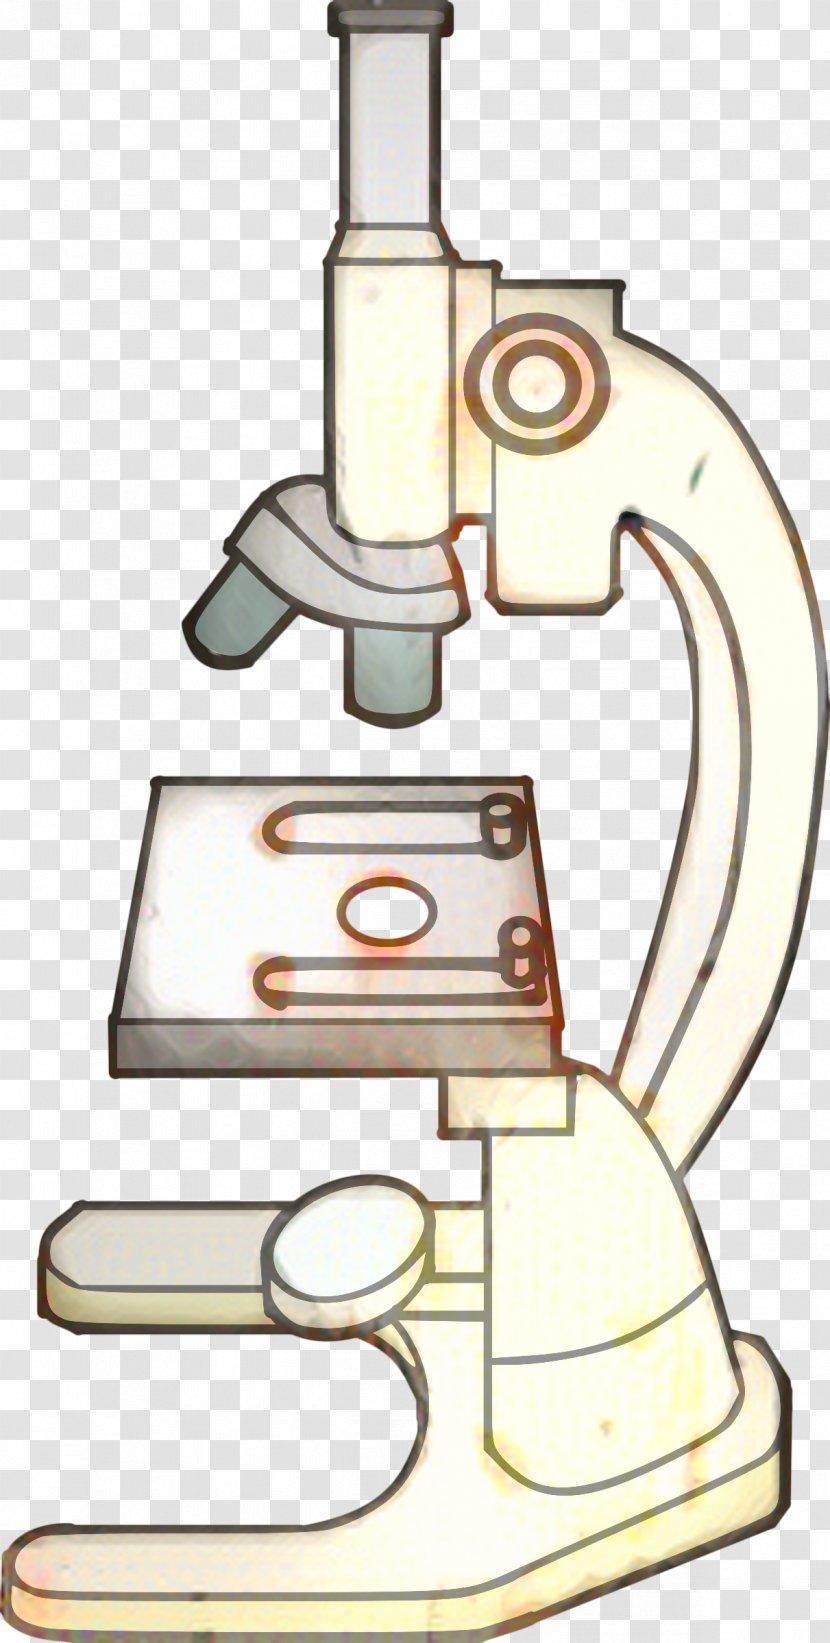 microscope cartoon line art transparent png line art transparent png